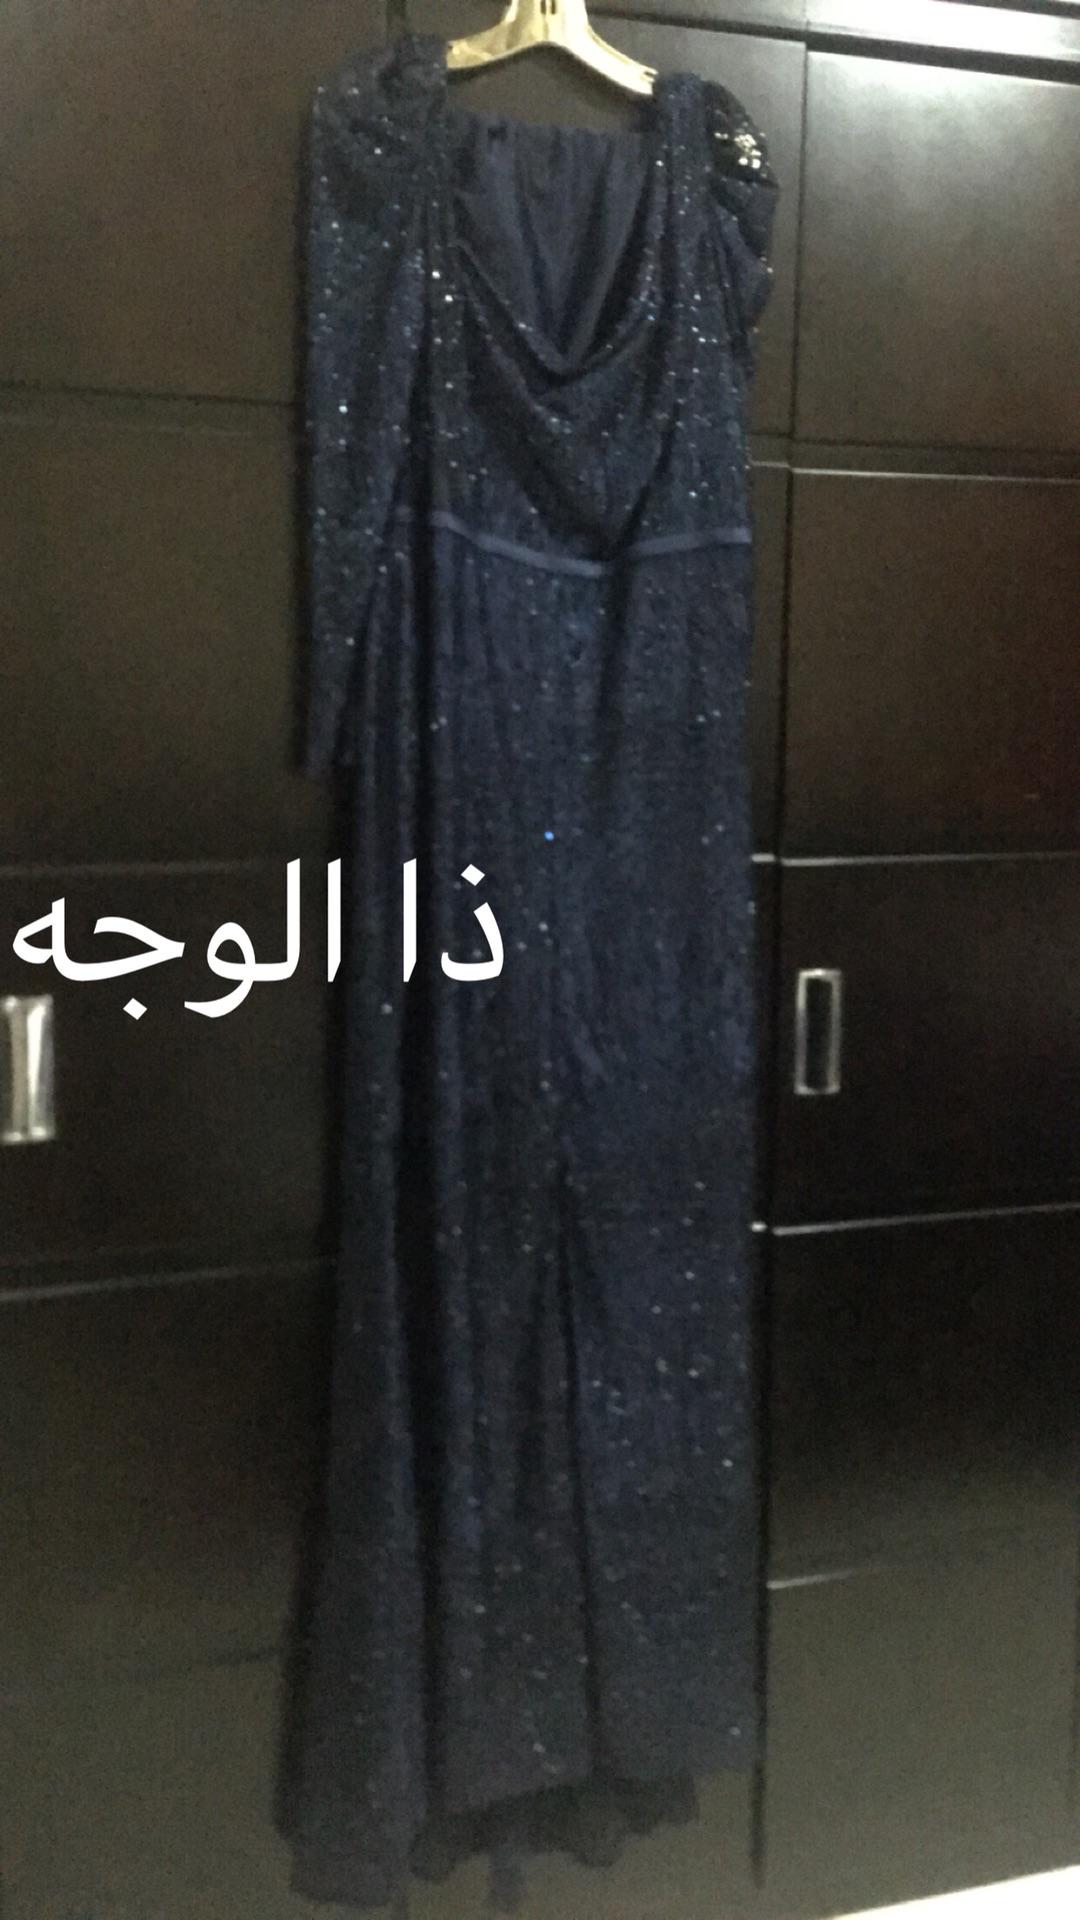 فستان سهره مقاس24 يعتبر جديد...